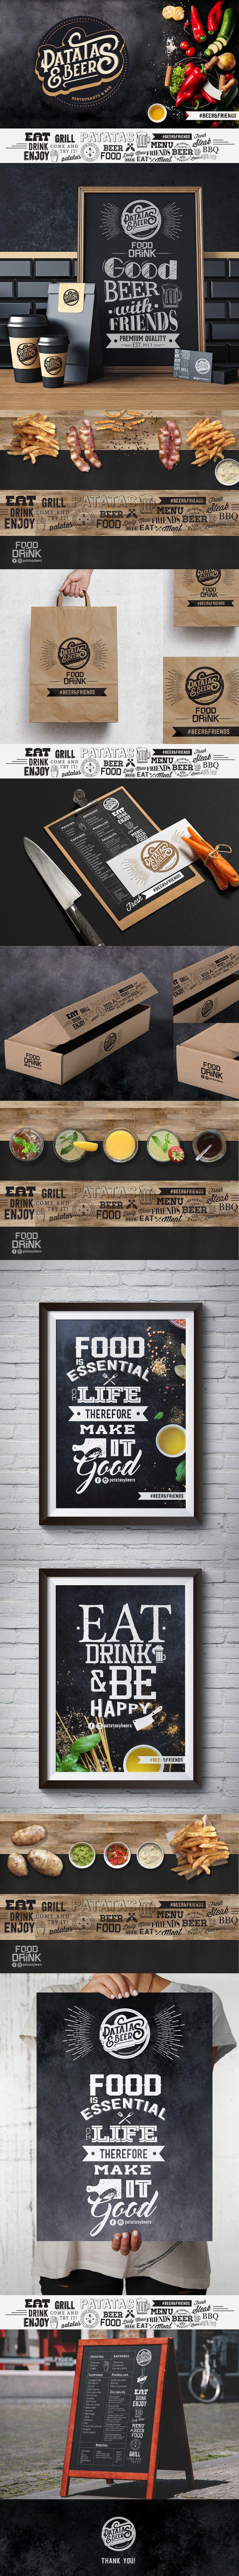 Echa un vistazo a mi proyecto @Behance: \u201cPATATAS & BEERS Restaurante Bar\u201d https://www.behance.net/gallery/48959565/PATATAS-BEERSRestaurante-Bar